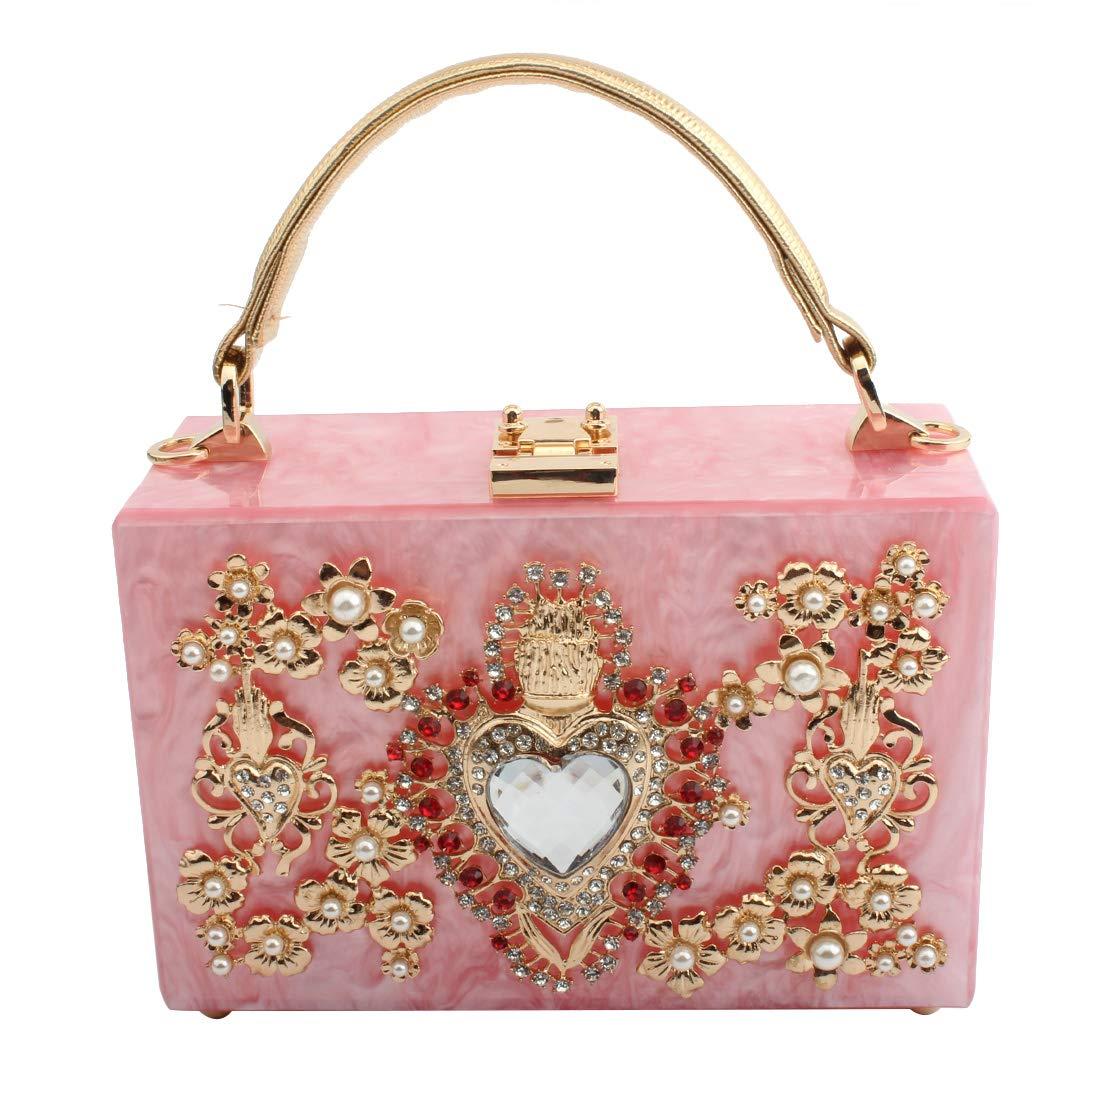 LETODE Women' Sparkling Crystal Clutch Purse Elegant Acrylic Evening Bags Wedding Party Handbag Pursey (PINK)